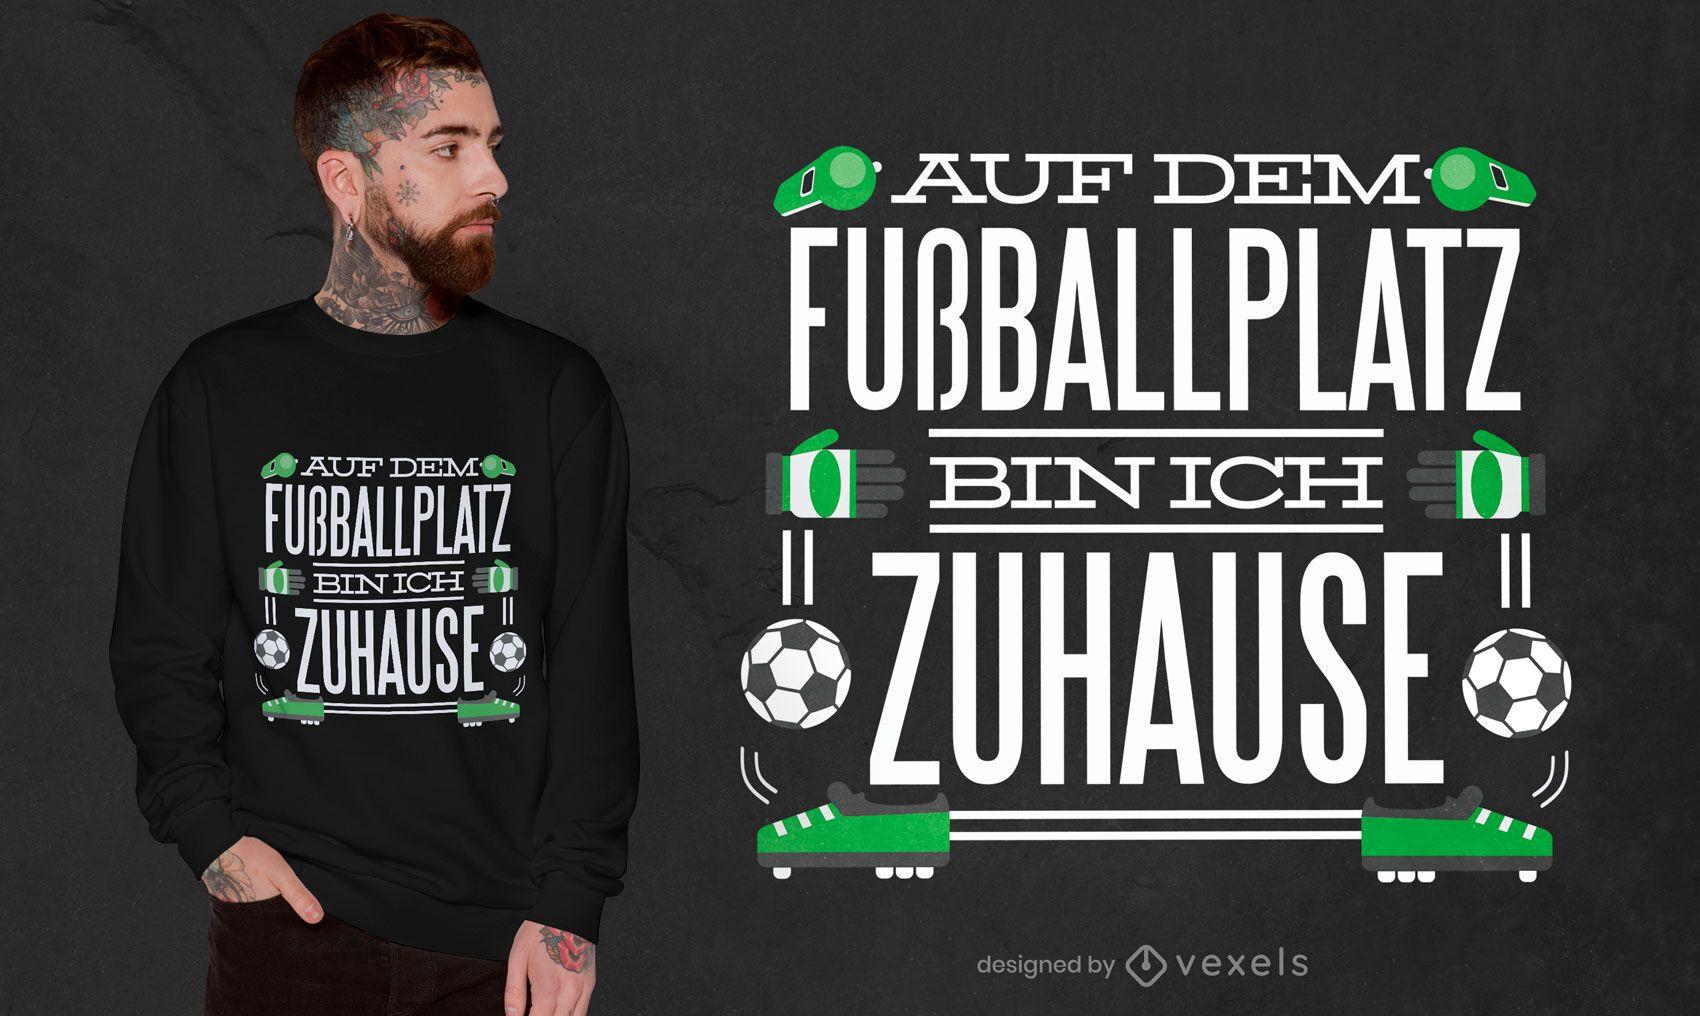 Diseño de camiseta con cita de campo de fútbol.